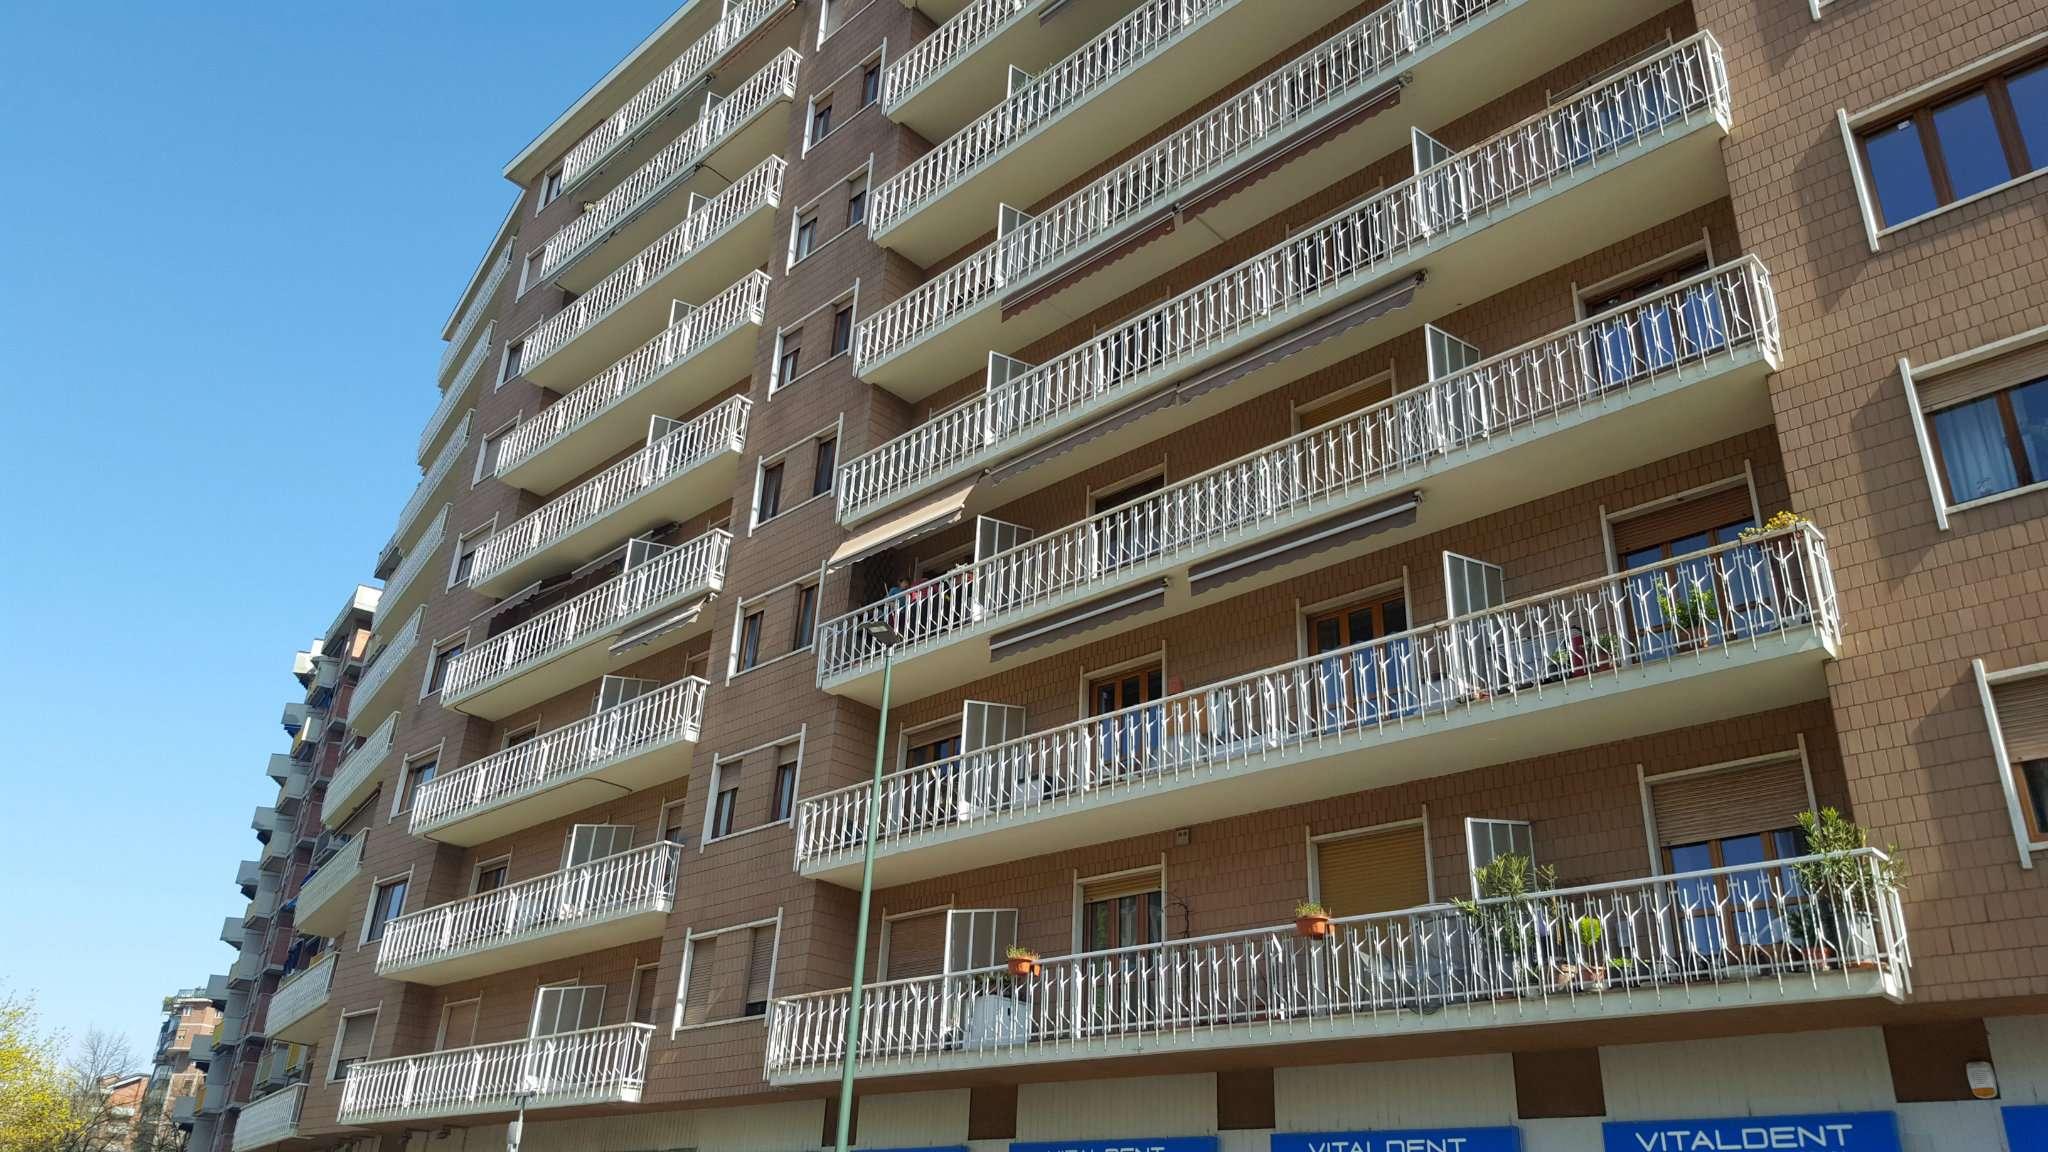 Appartamenti in affitto a torino for Case arredate in affitto a torino